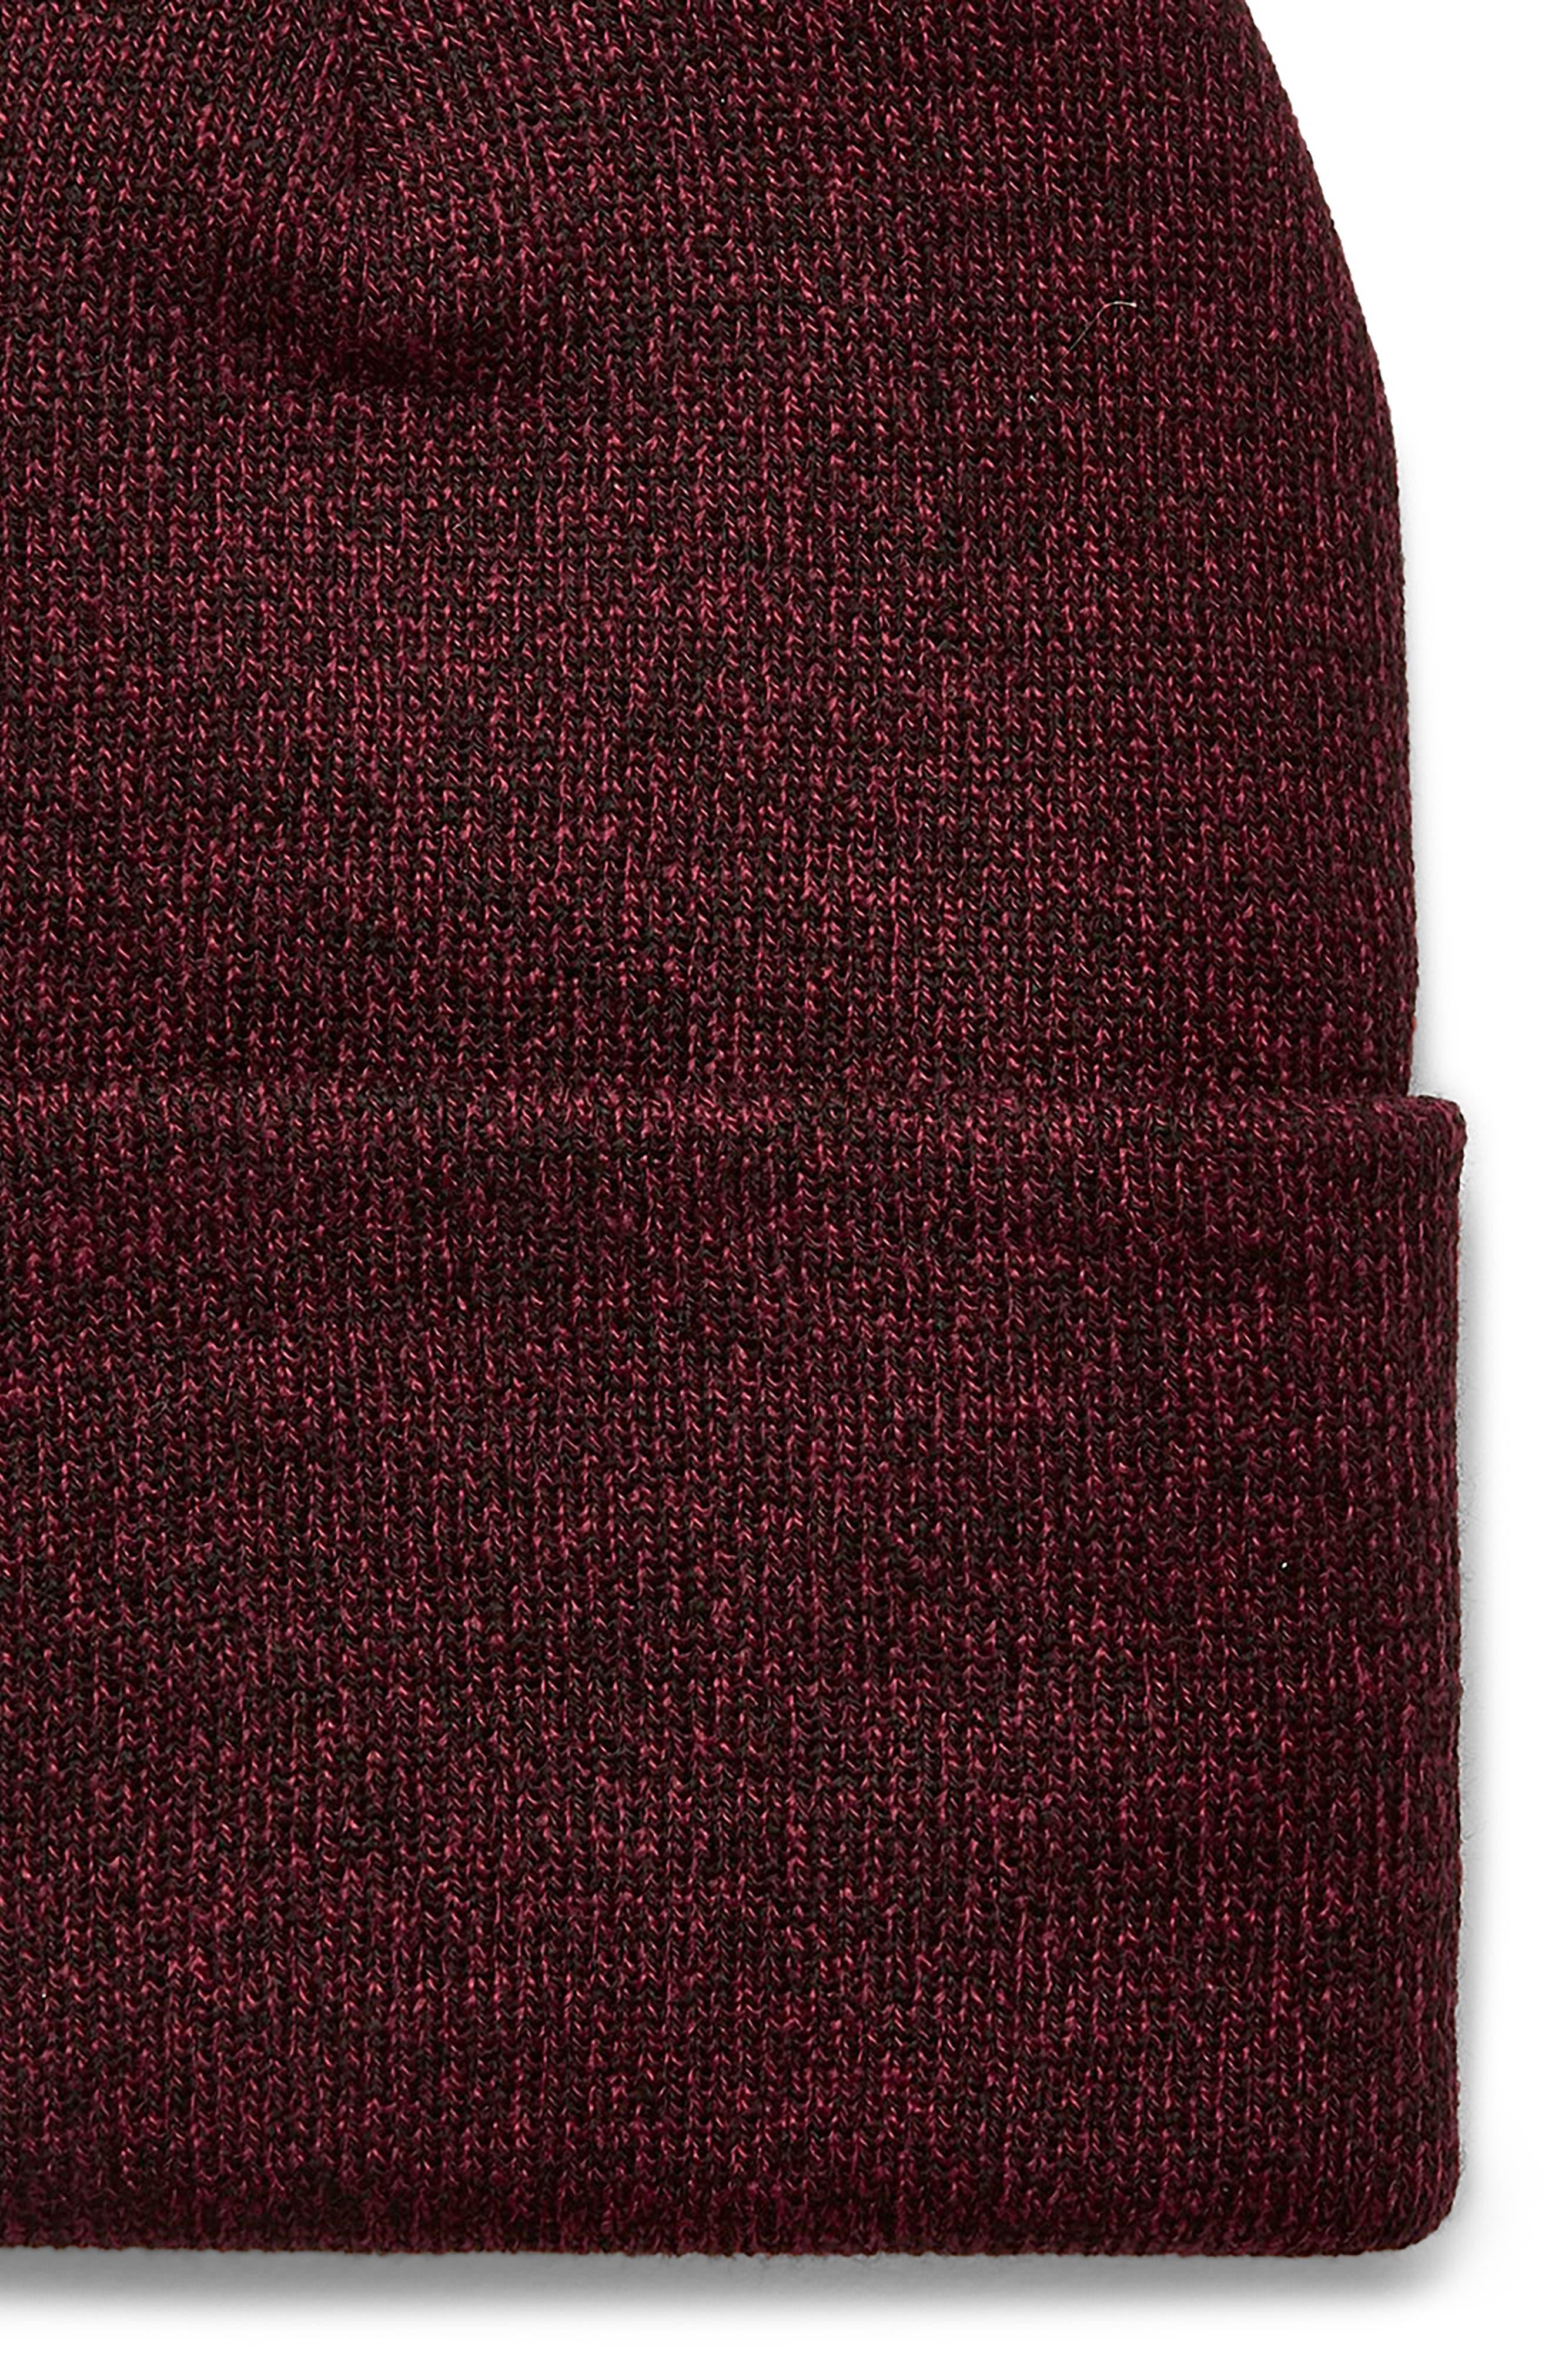 Knit Beanie,                             Alternate thumbnail 2, color,                             930